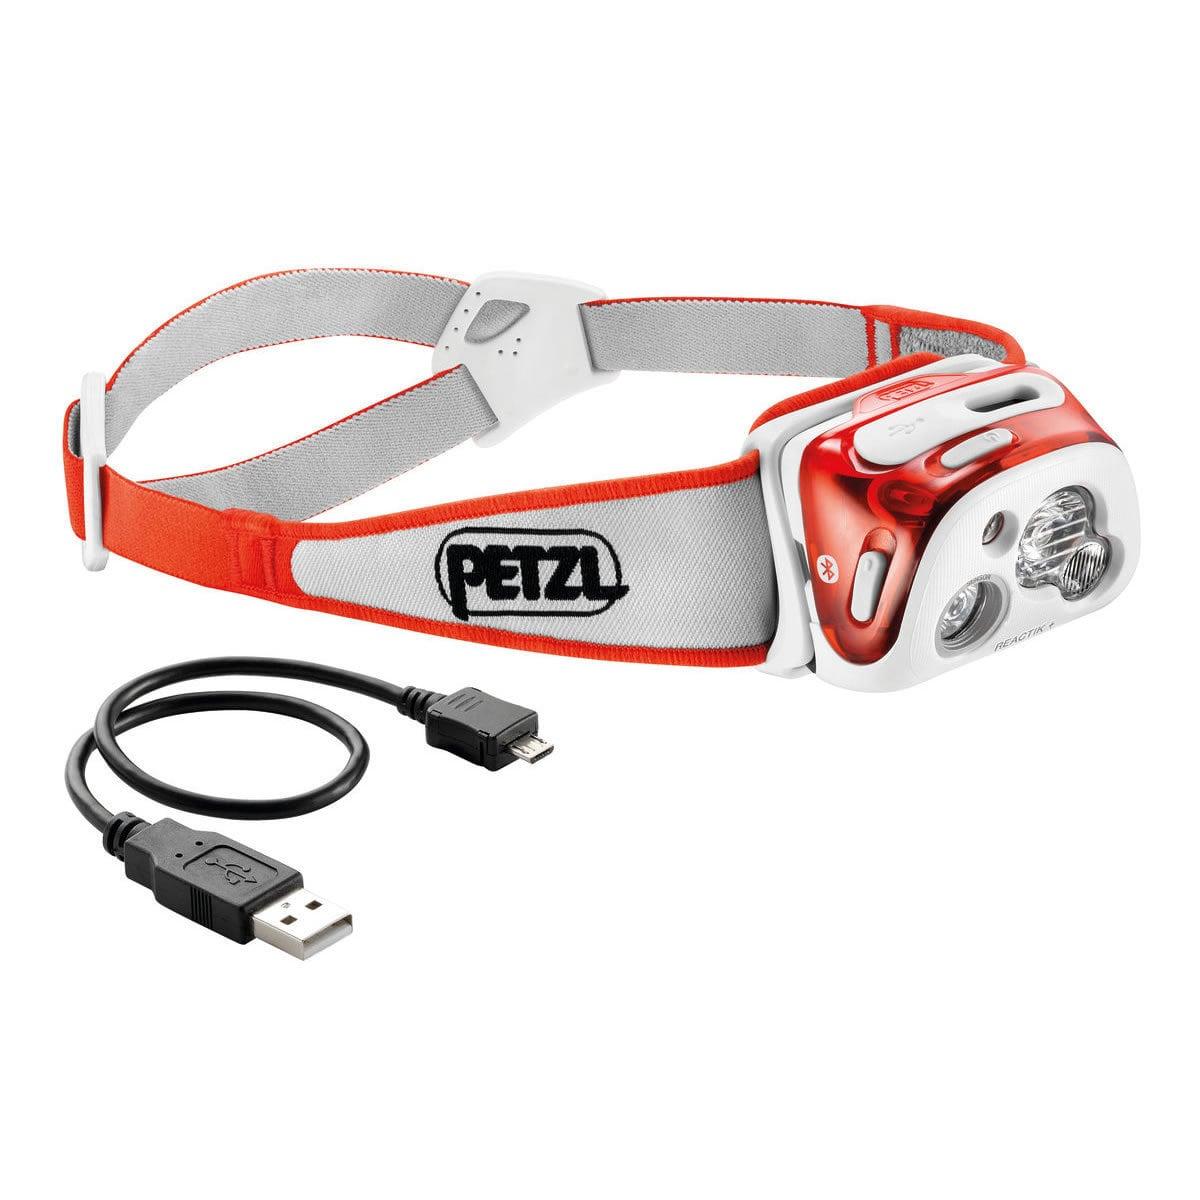 Petzl  REACTIK + 300 Lumens Headlamp Coral - Orange